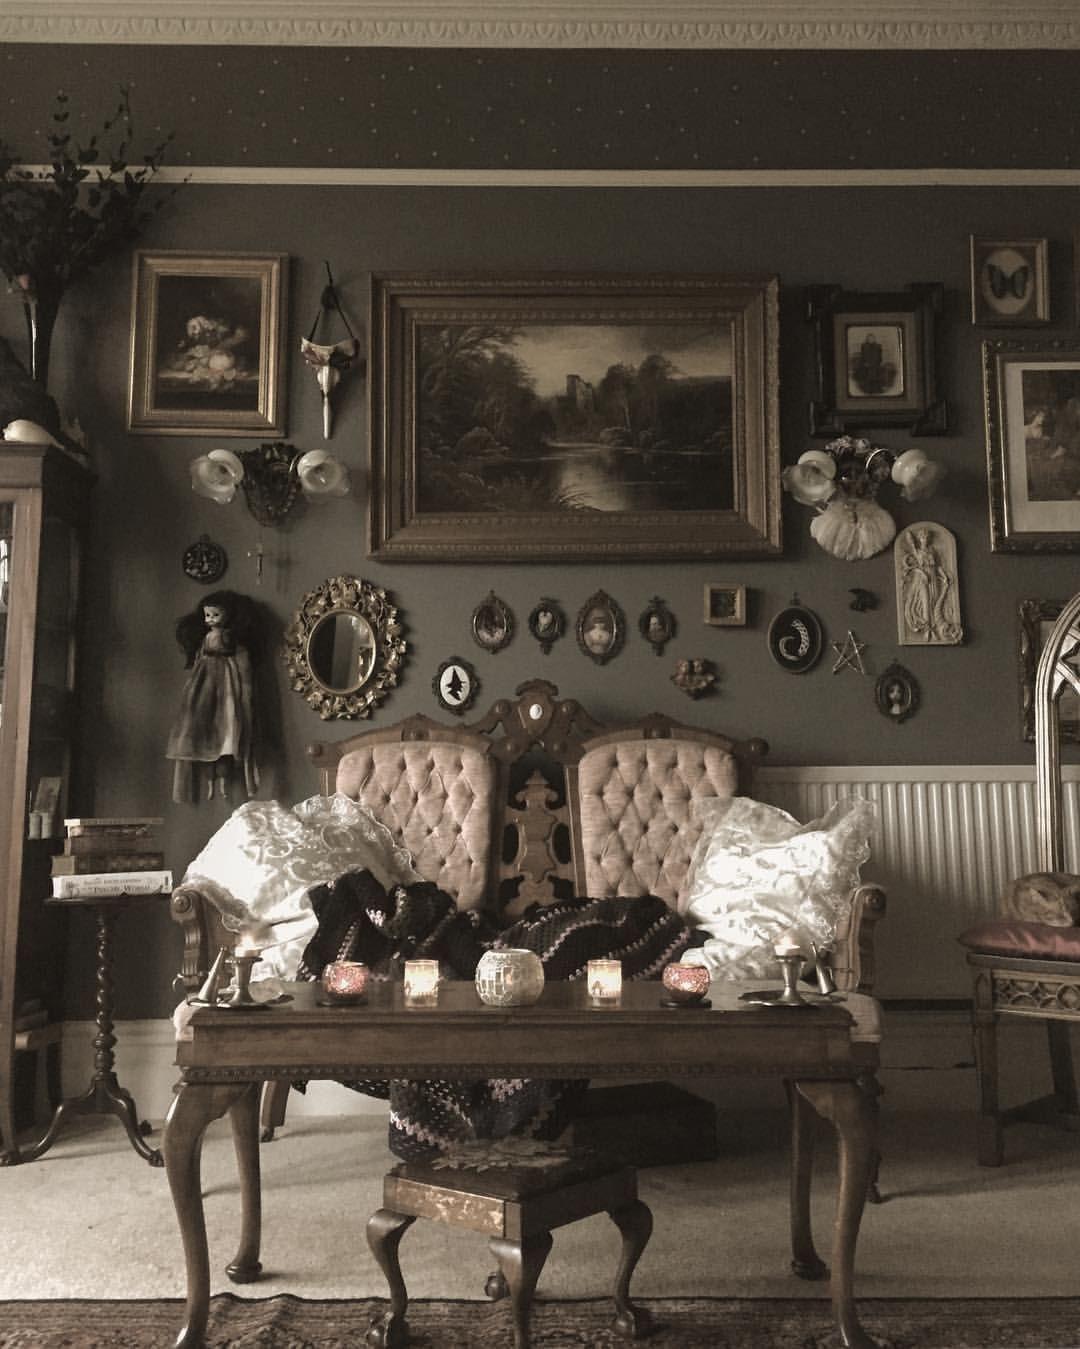 Cool Steampunk Bedroom Interior Decorating Design Ideas Gothic